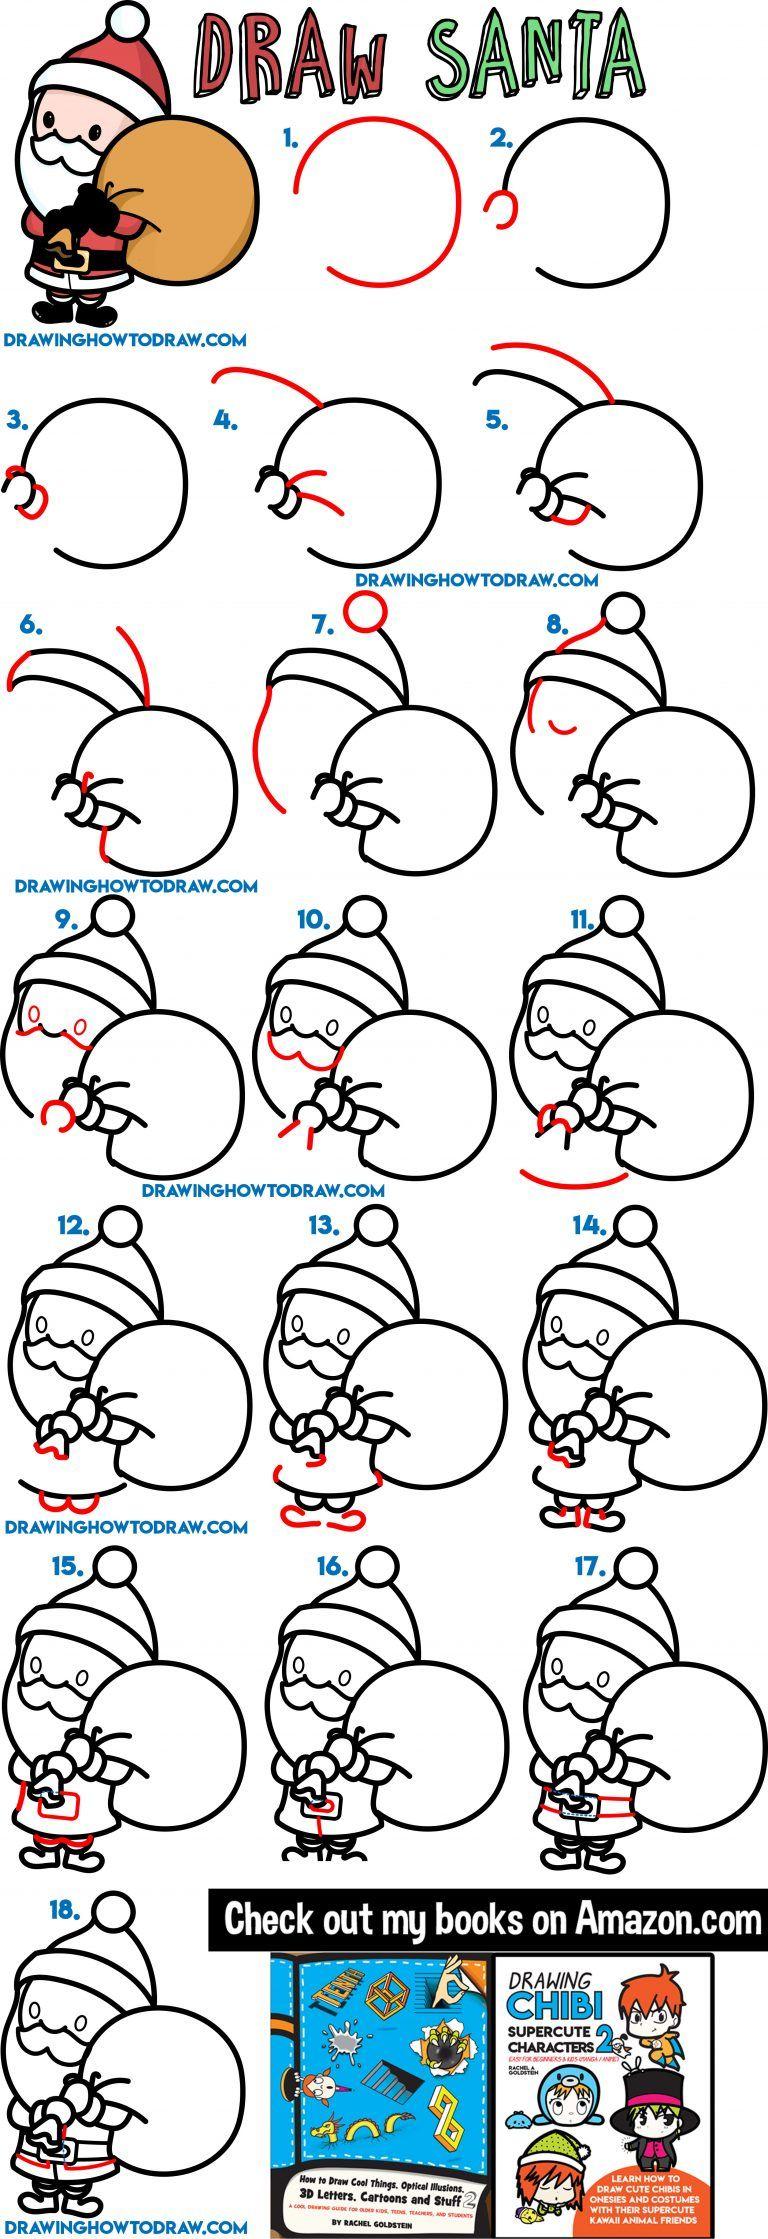 How to Draw a Cute Cartoon Santa Claus Easy Steps Tutorial